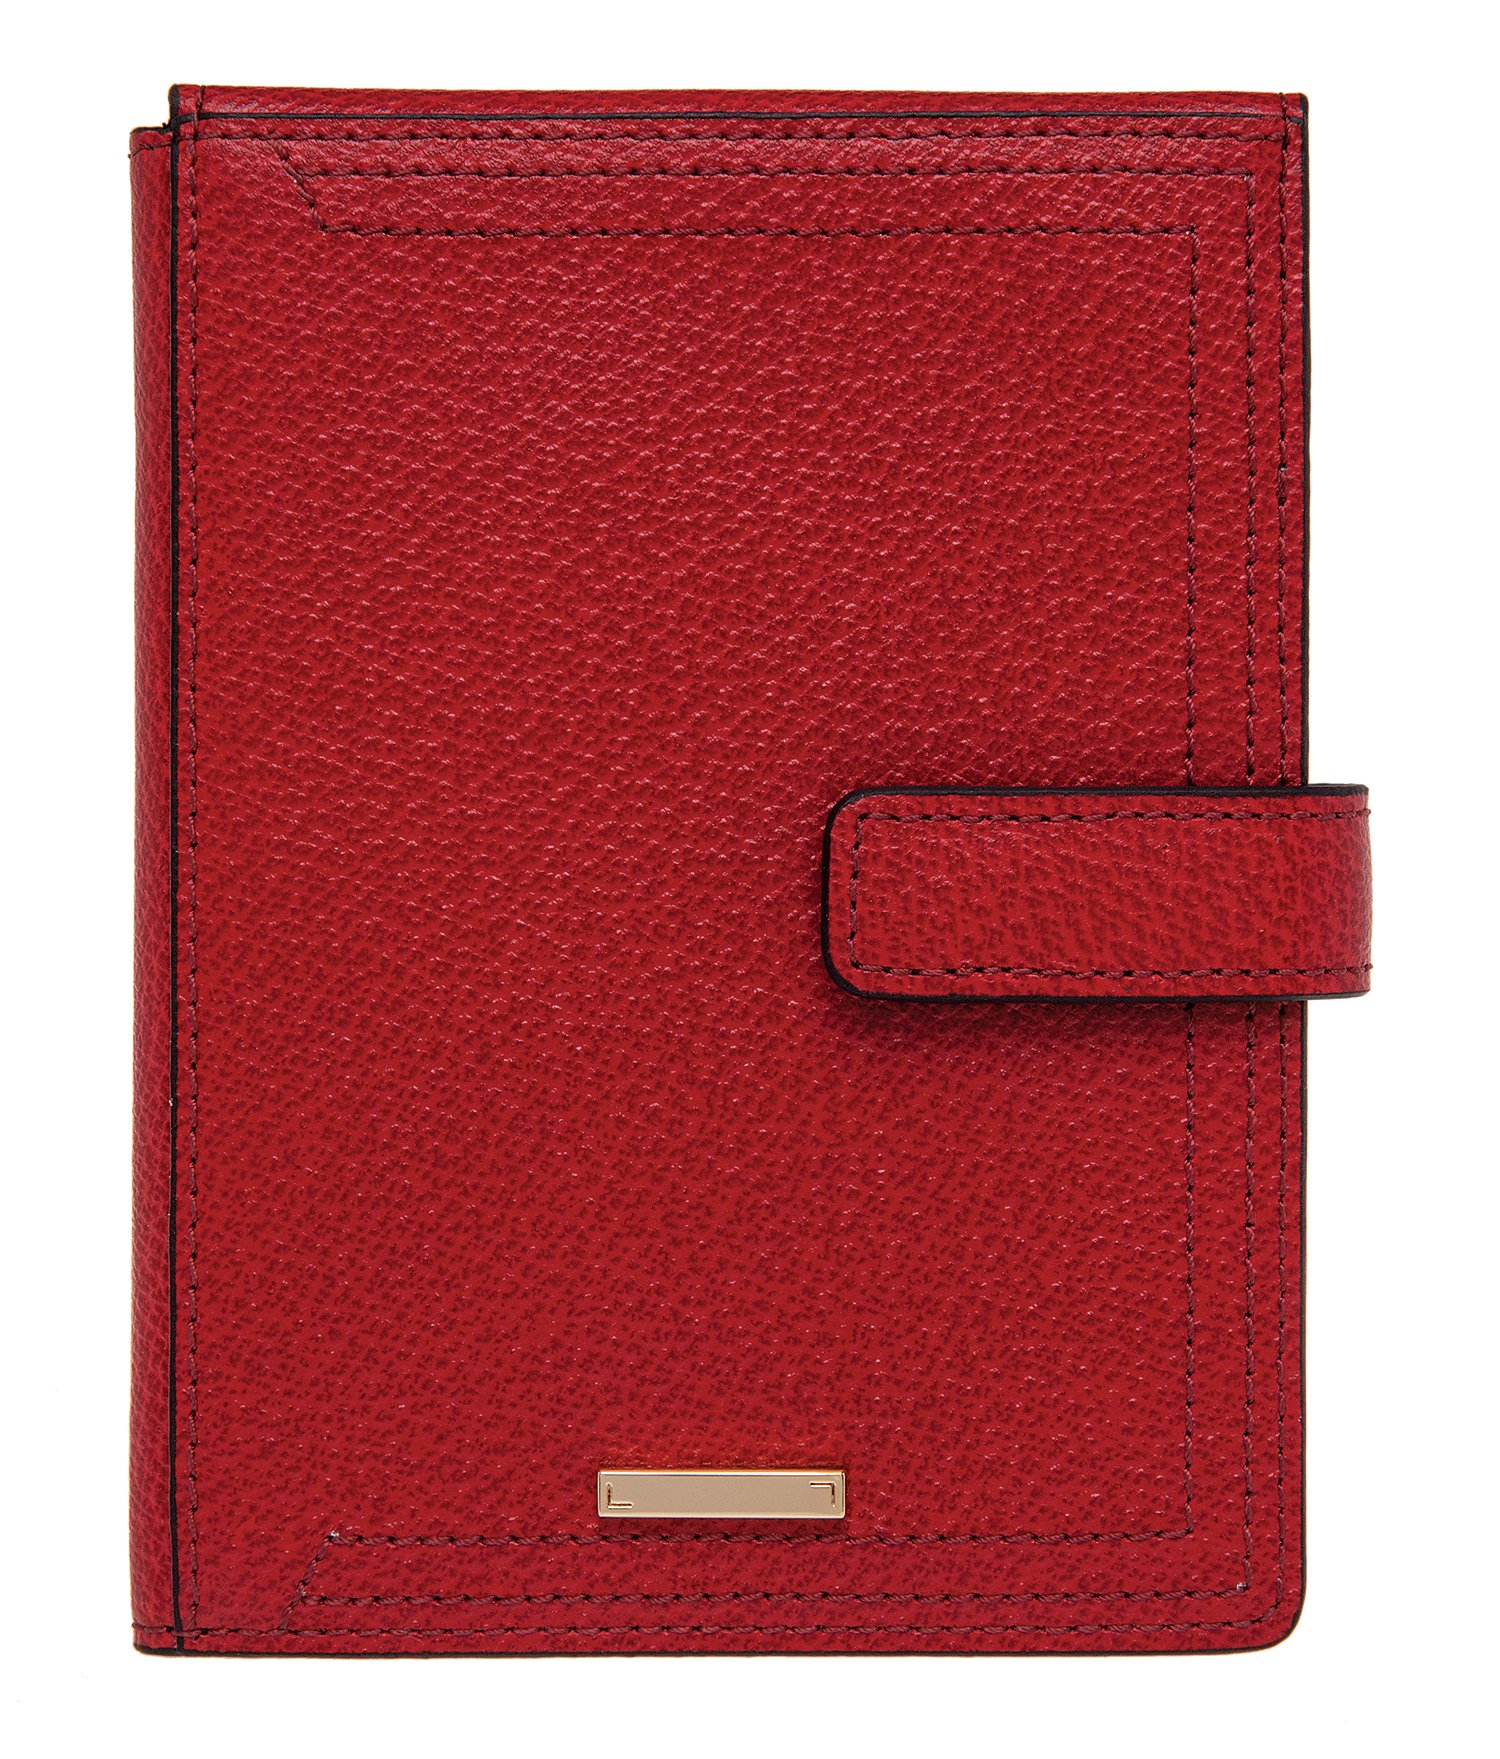 Lodis Women's Stephanie RFID Under Lock & Key Passport Wallet W/Ticket Flap, Red, One Size